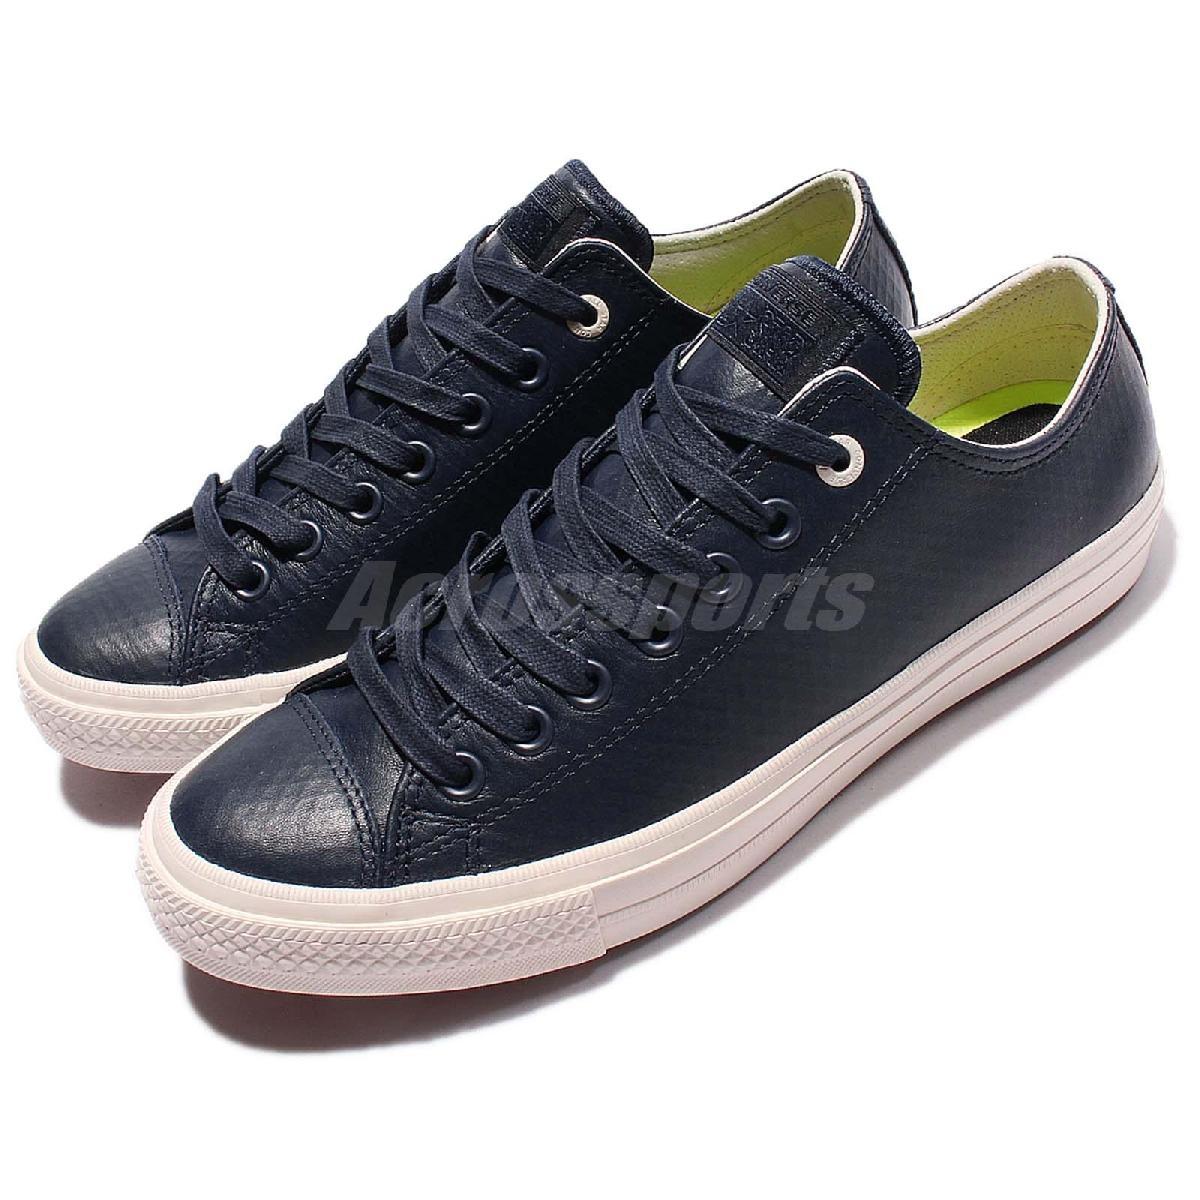 Converse Chuck Taylor All Star II藍白奶油底低筒精緻皮革帆布鞋男鞋PUMP306 153557C